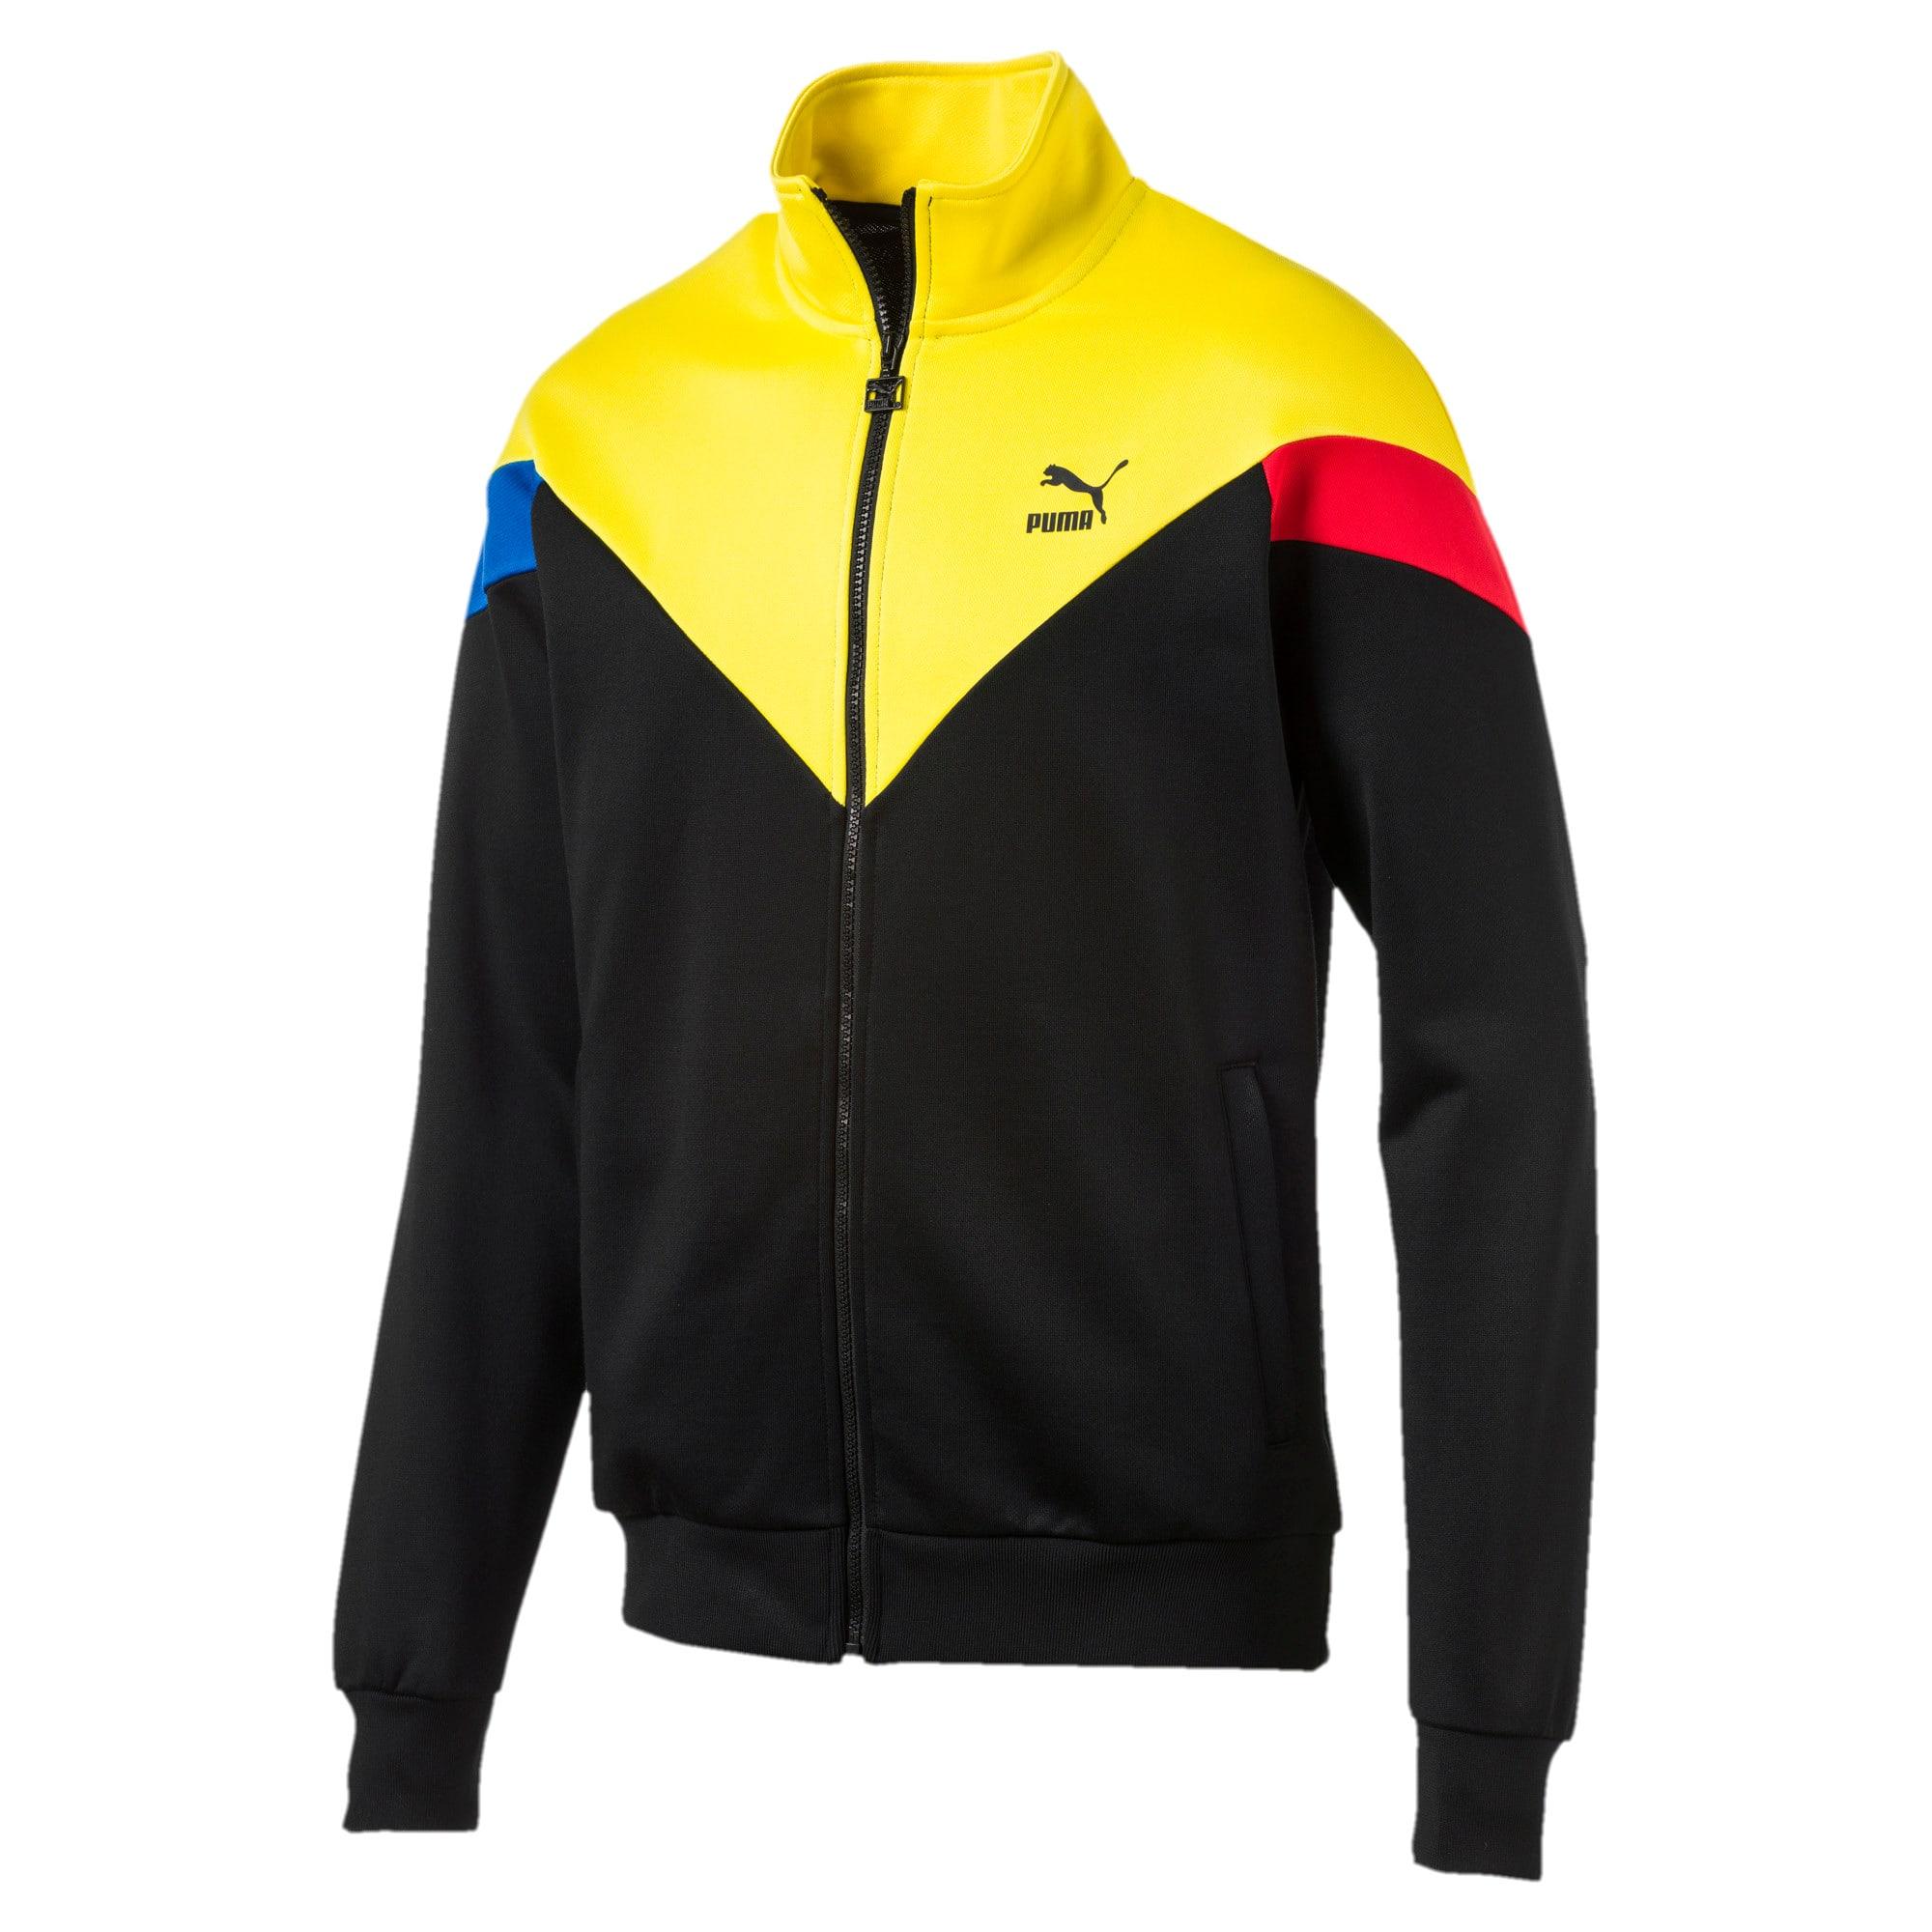 Thumbnail 1 of Iconic MCS Men's Track Jacket, Puma Black-yellow, medium